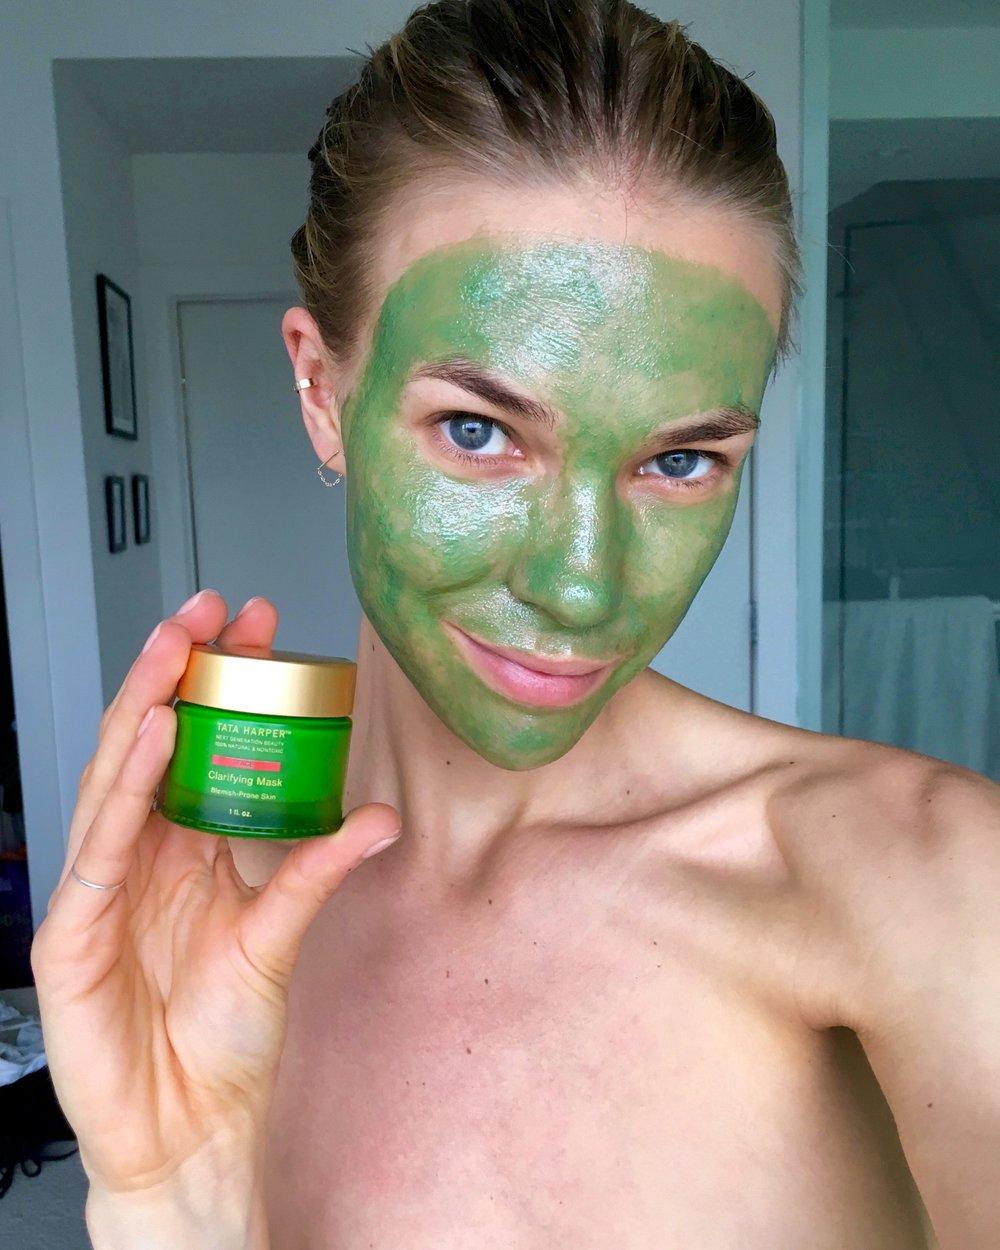 tata harper green mask2.jpg